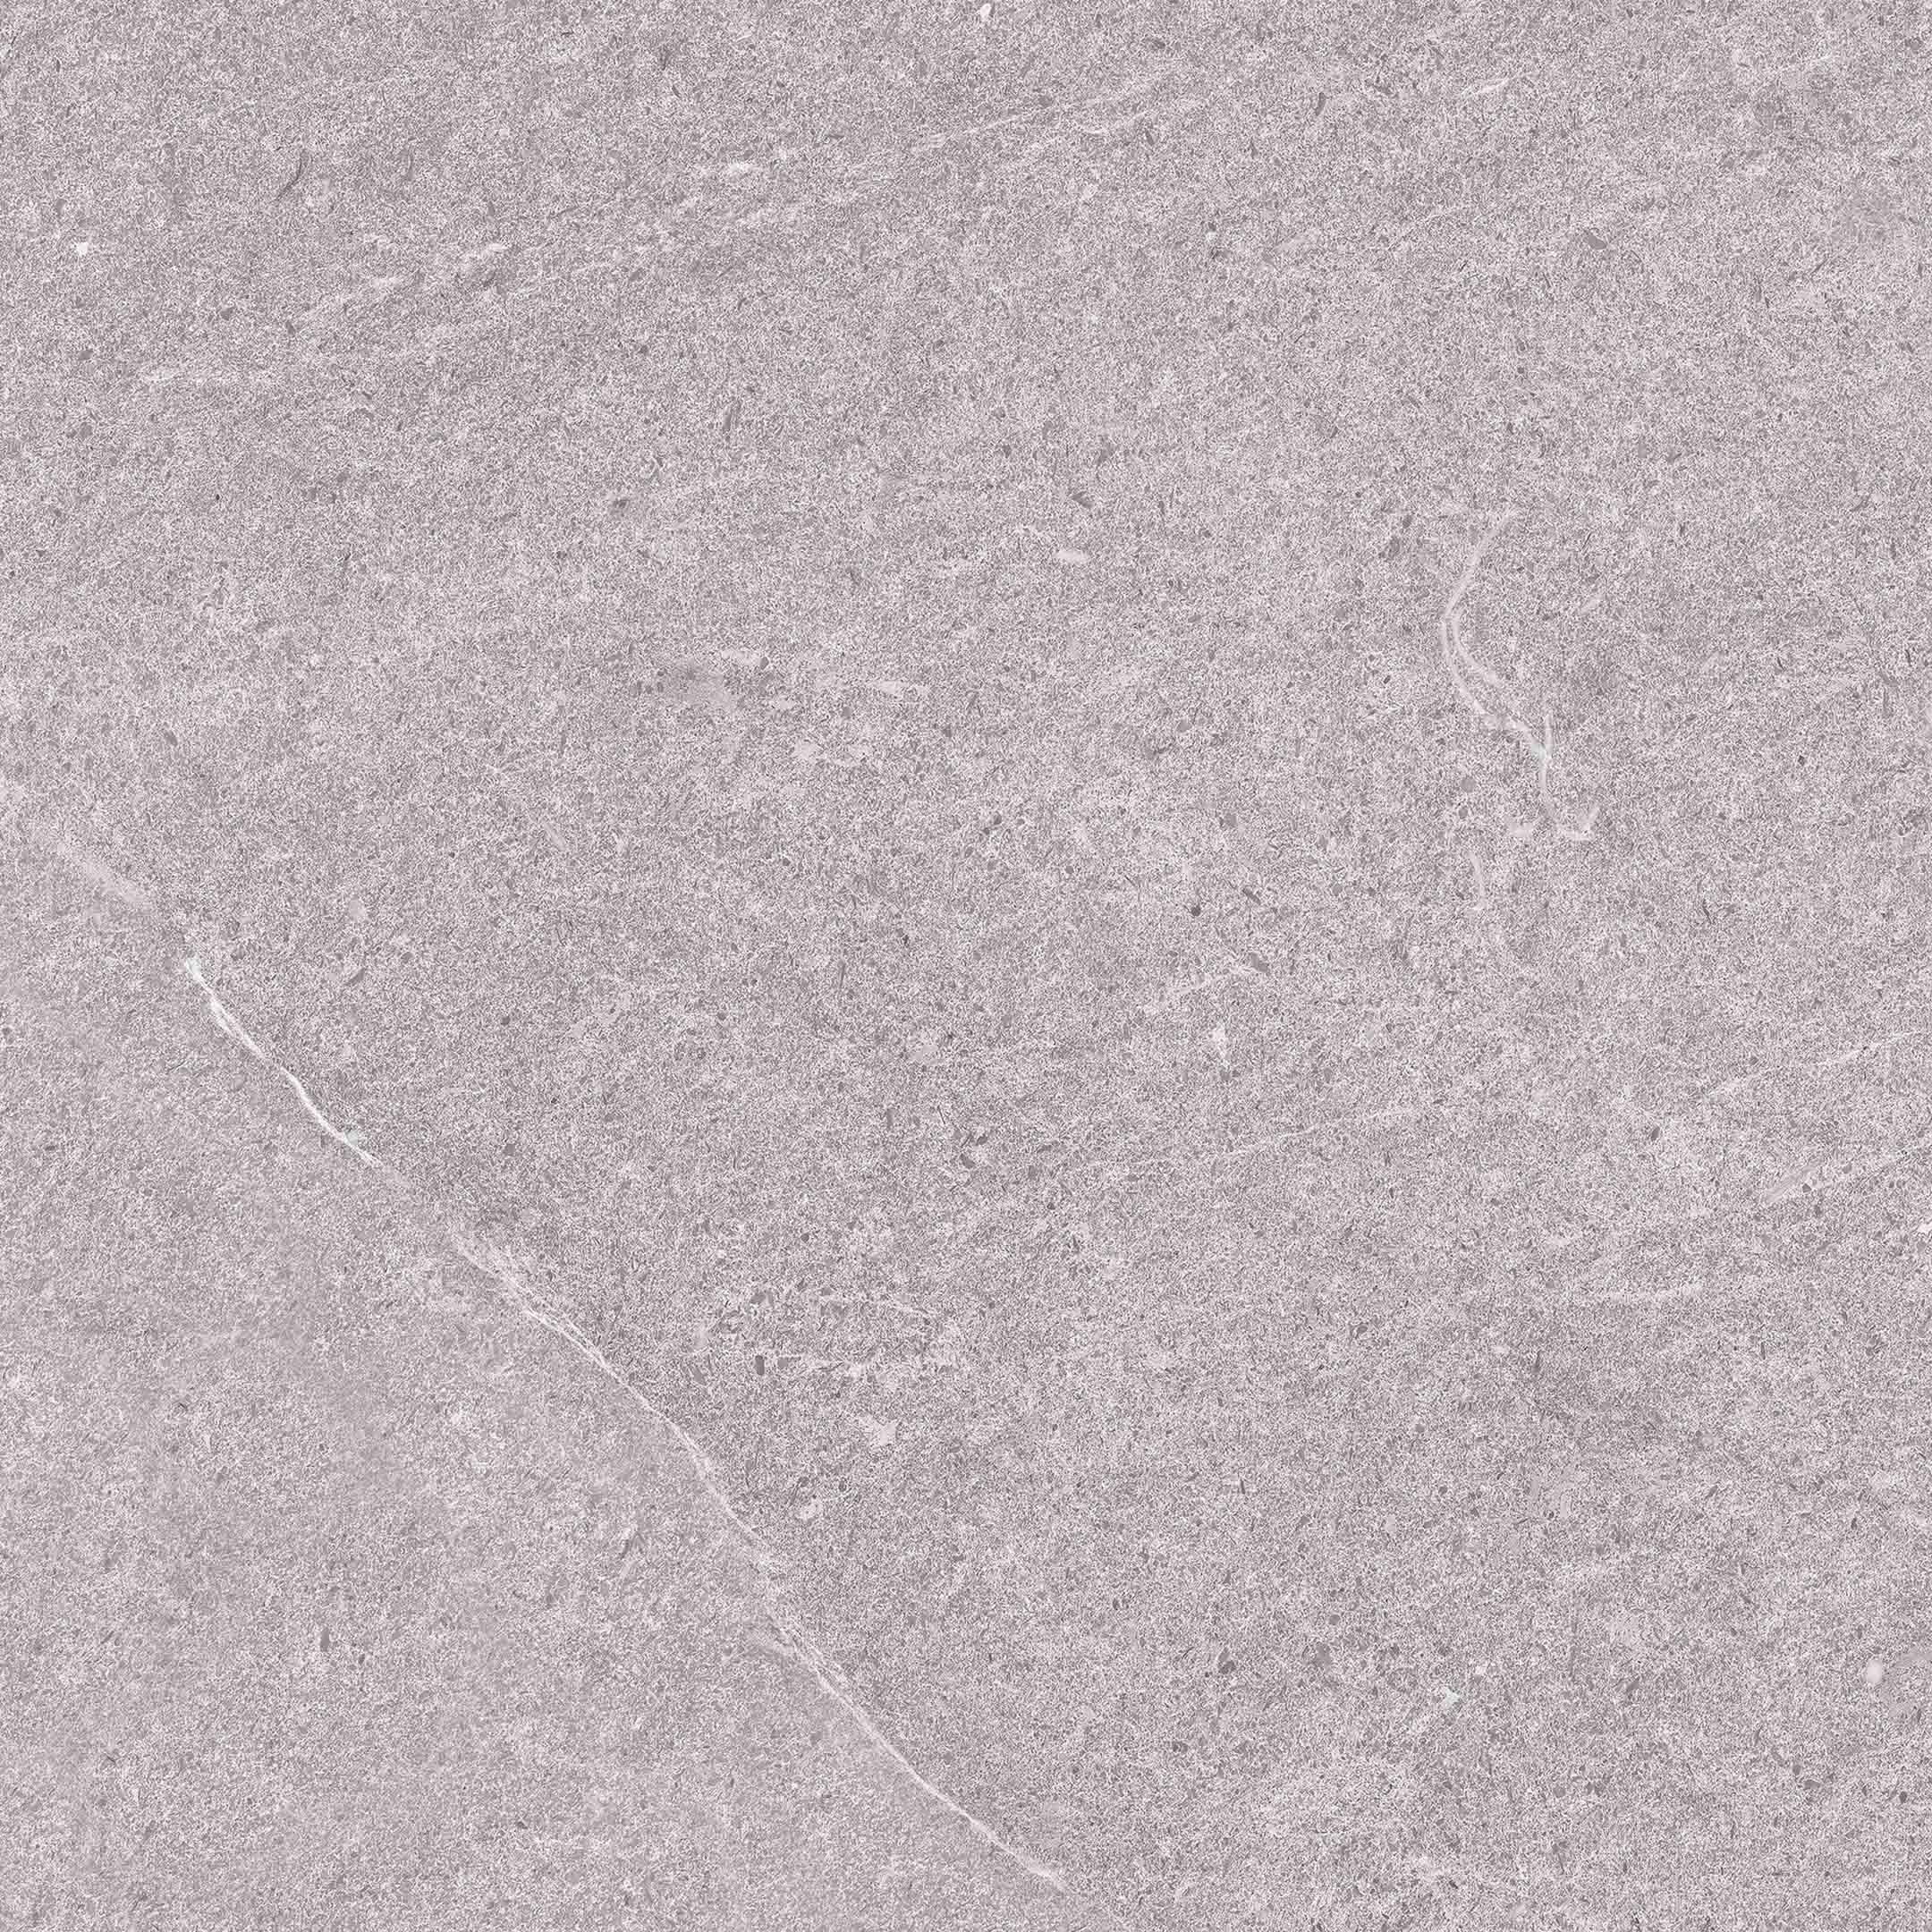 Керамогранит Unitile Life Норд серый 300х300х8 мм (14 шт.=1,26 кв.м)